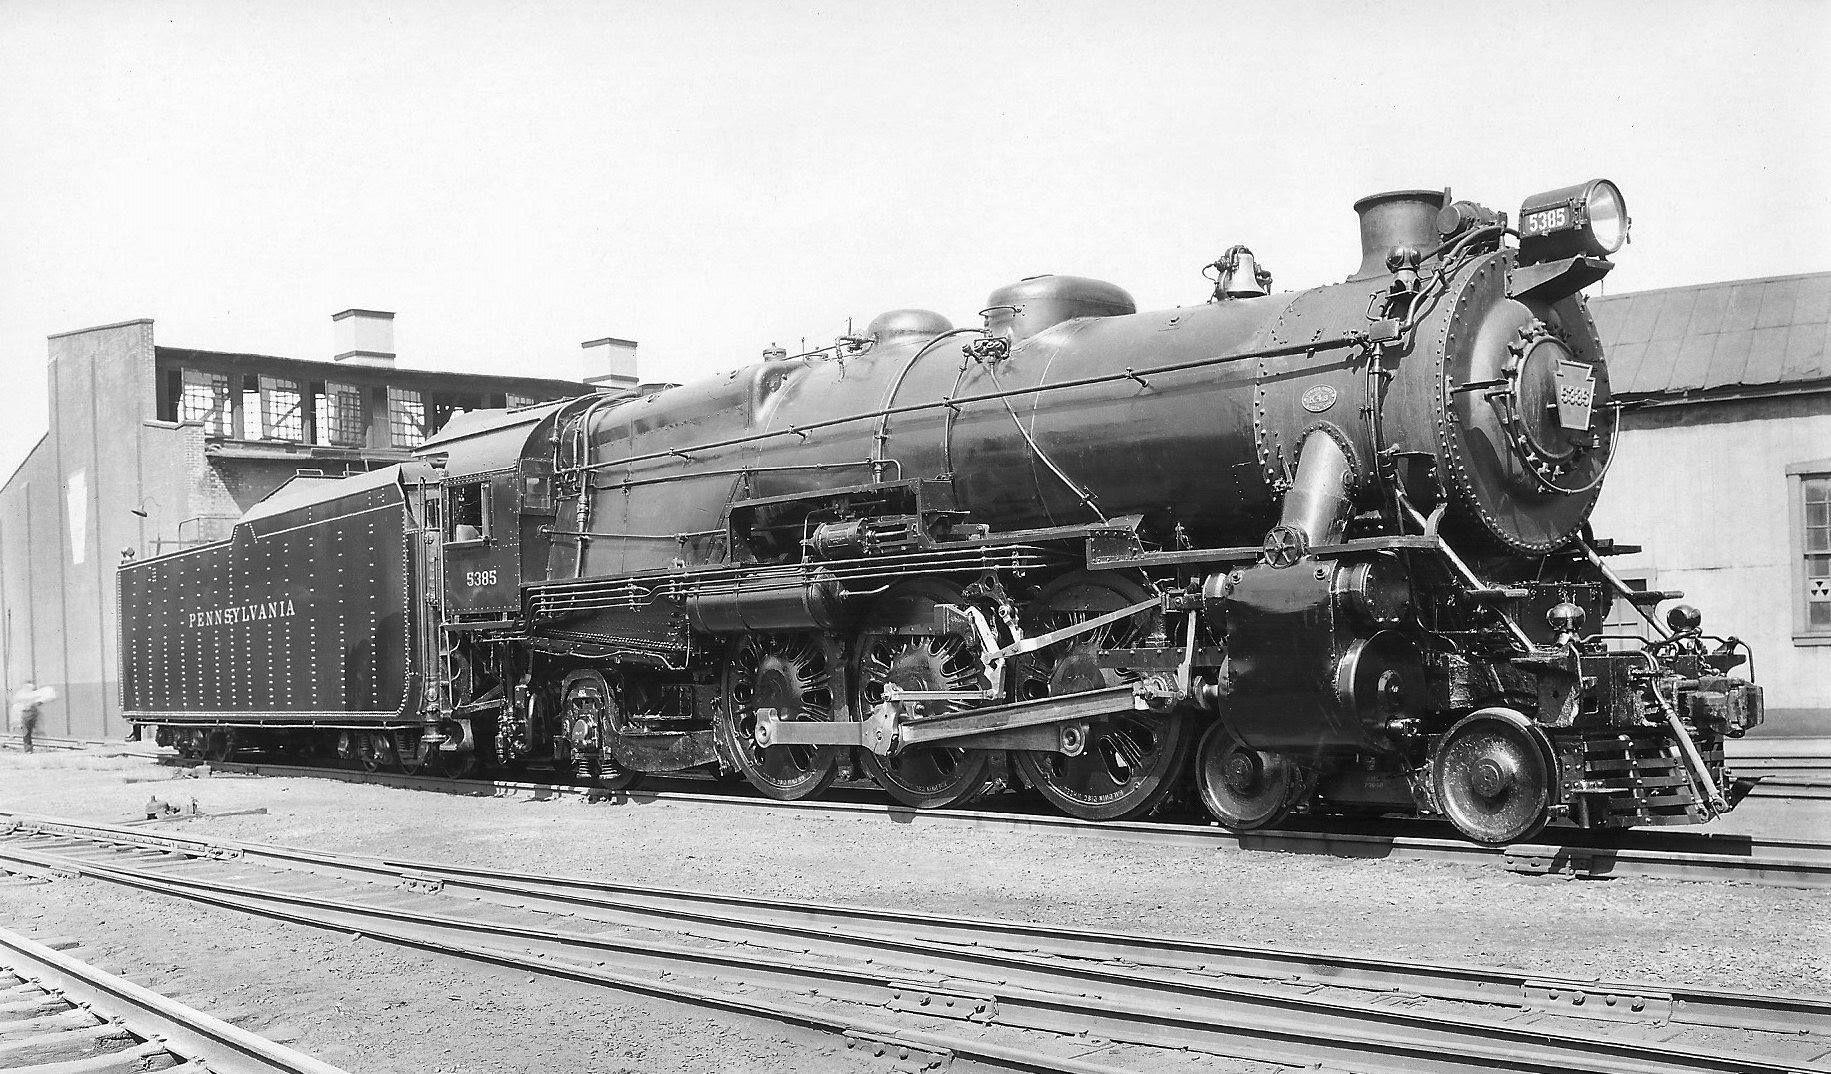 Class K4s )  Pennsylvania R R   4-6-2 Pacific  Built by PRR